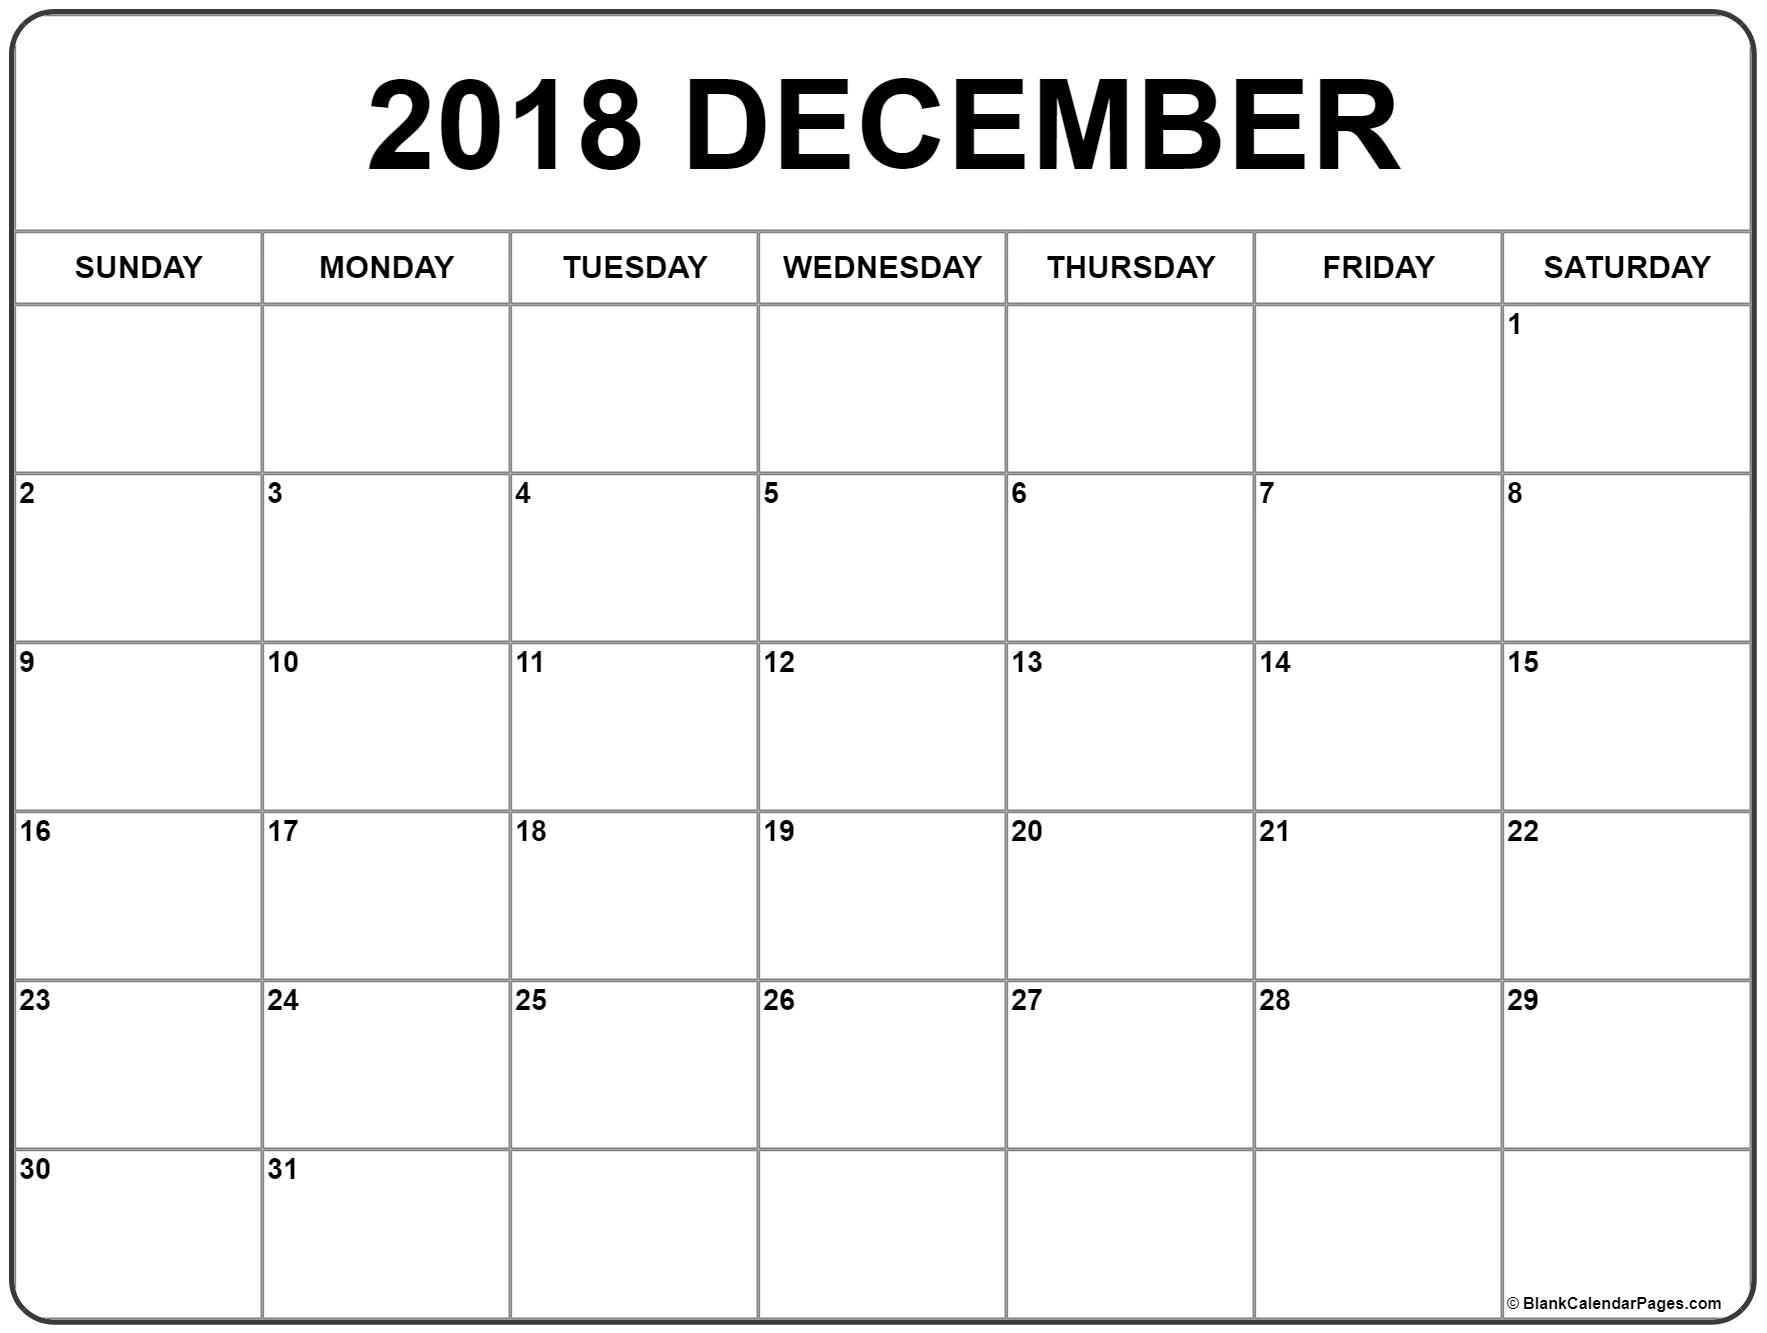 December 2018 Calendar December 2018 Calendar Printabledecember 2018 Printable Calendar De Calendar Printables June 2019 Calendar Monthly Calendar Printable